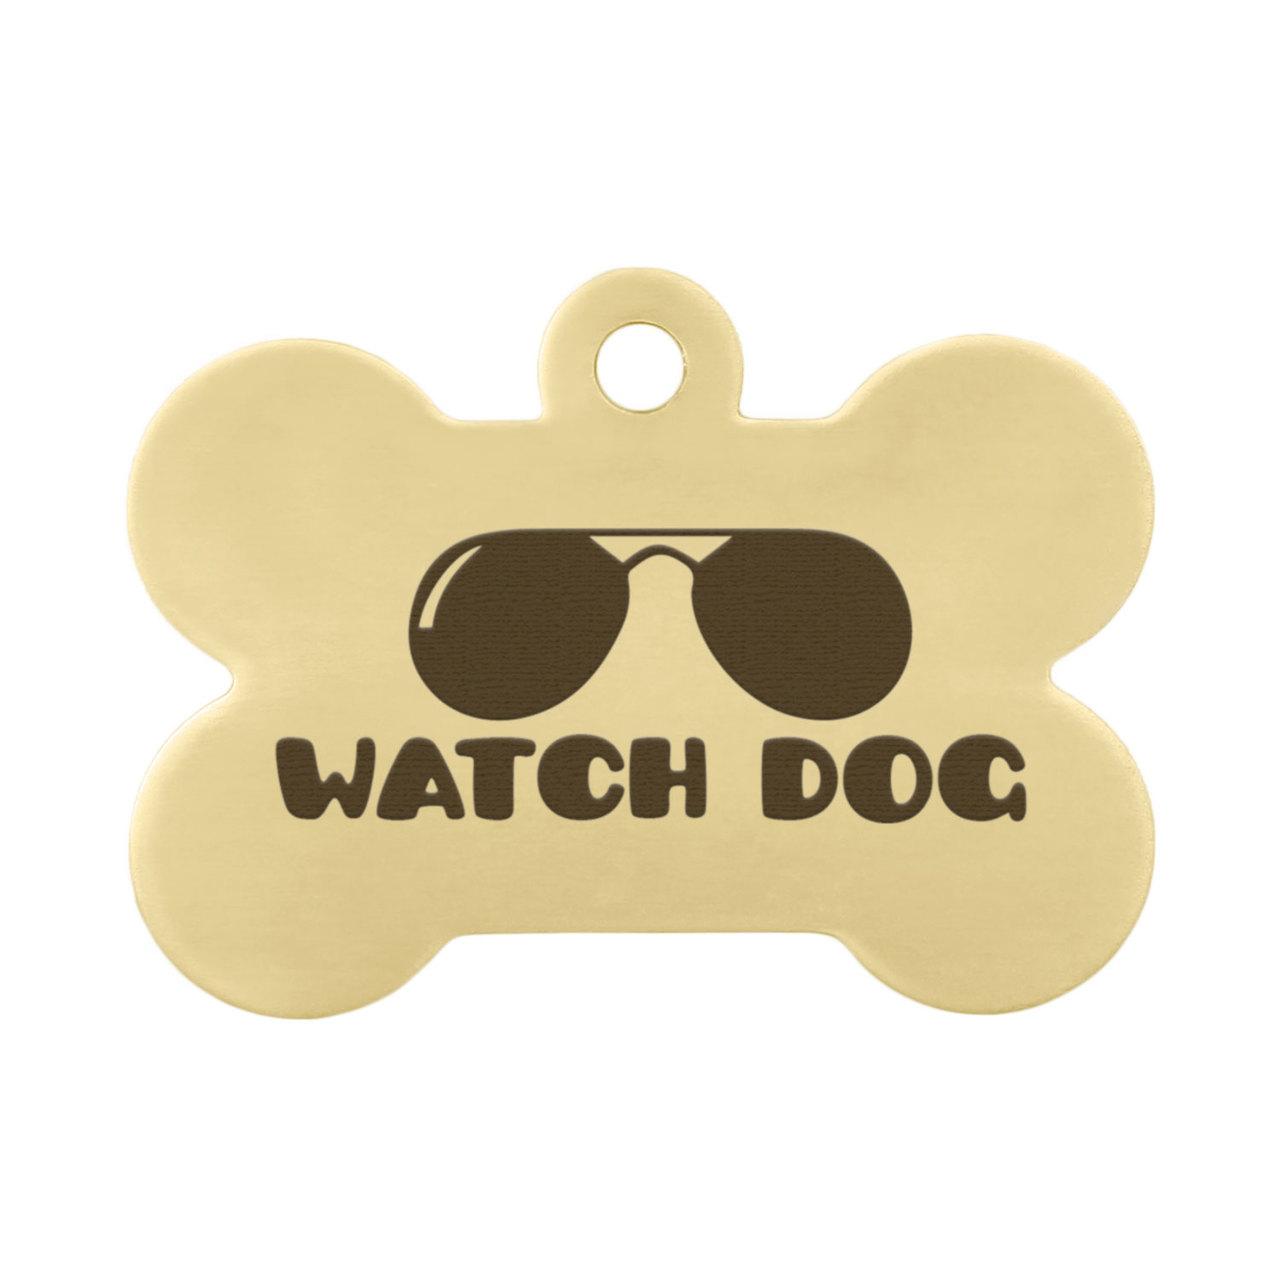 Watch Dog Pet ID Tag